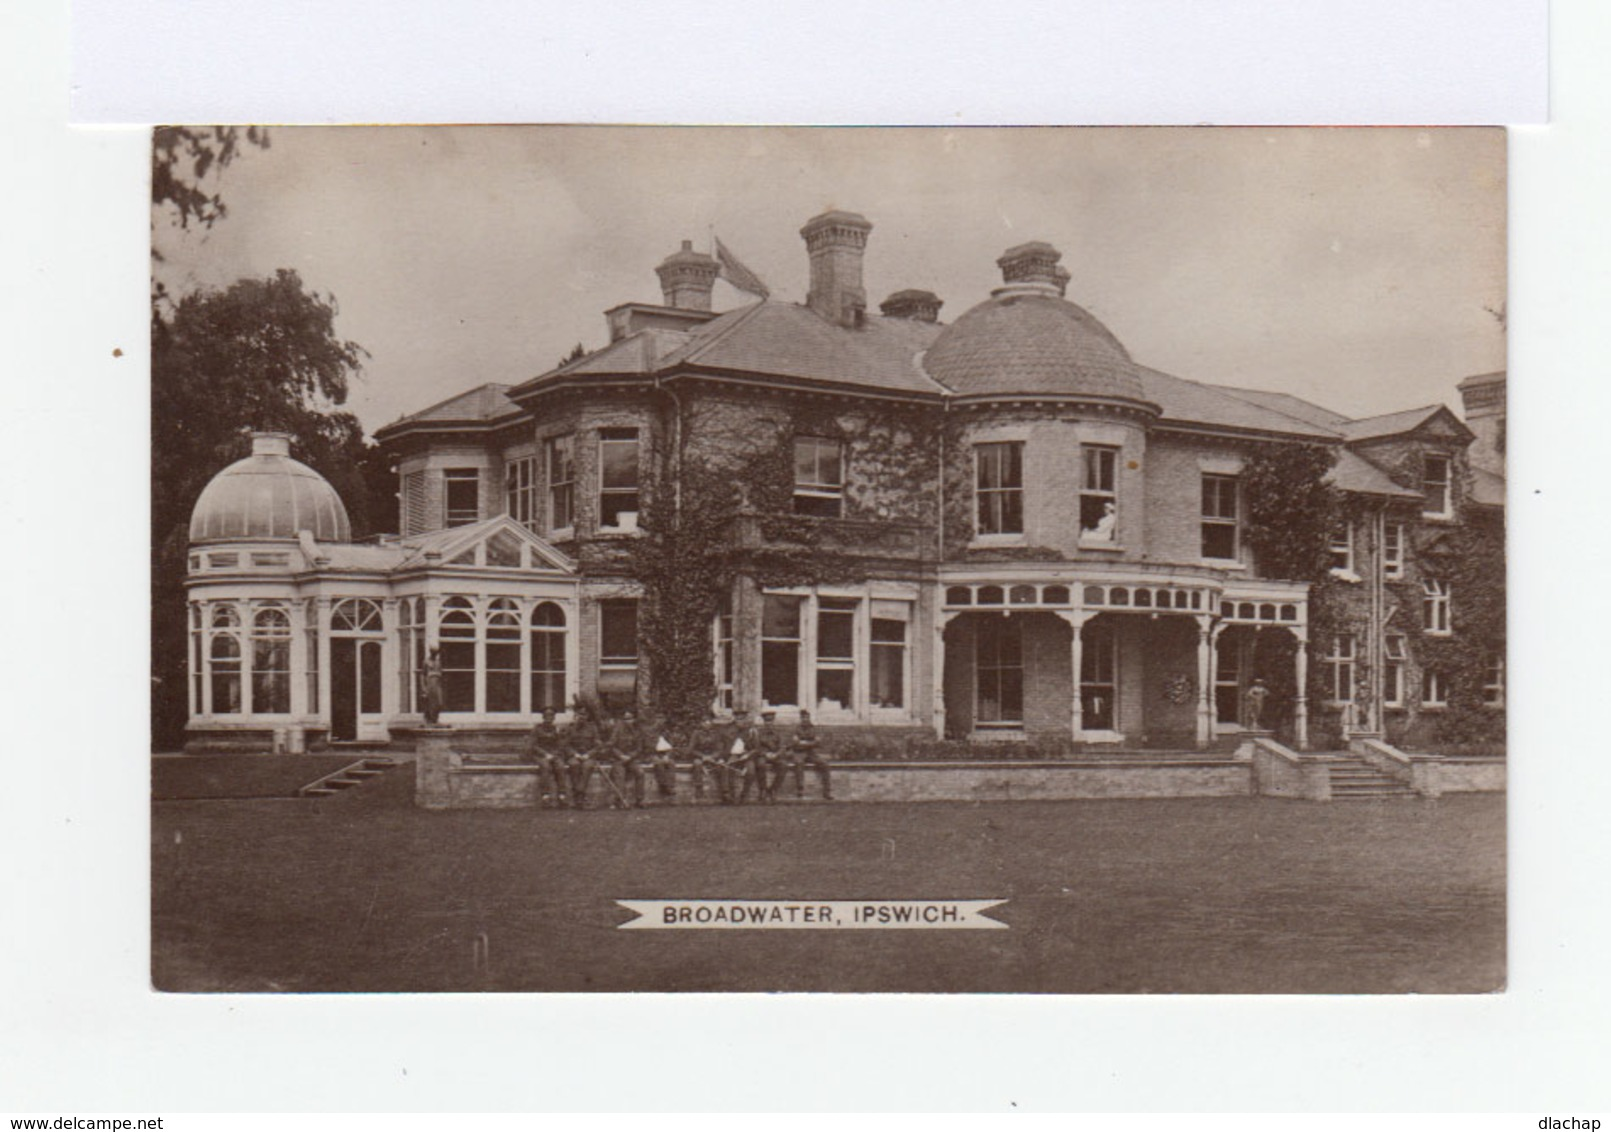 Broadwater. Ipswich. (3147) - Ipswich